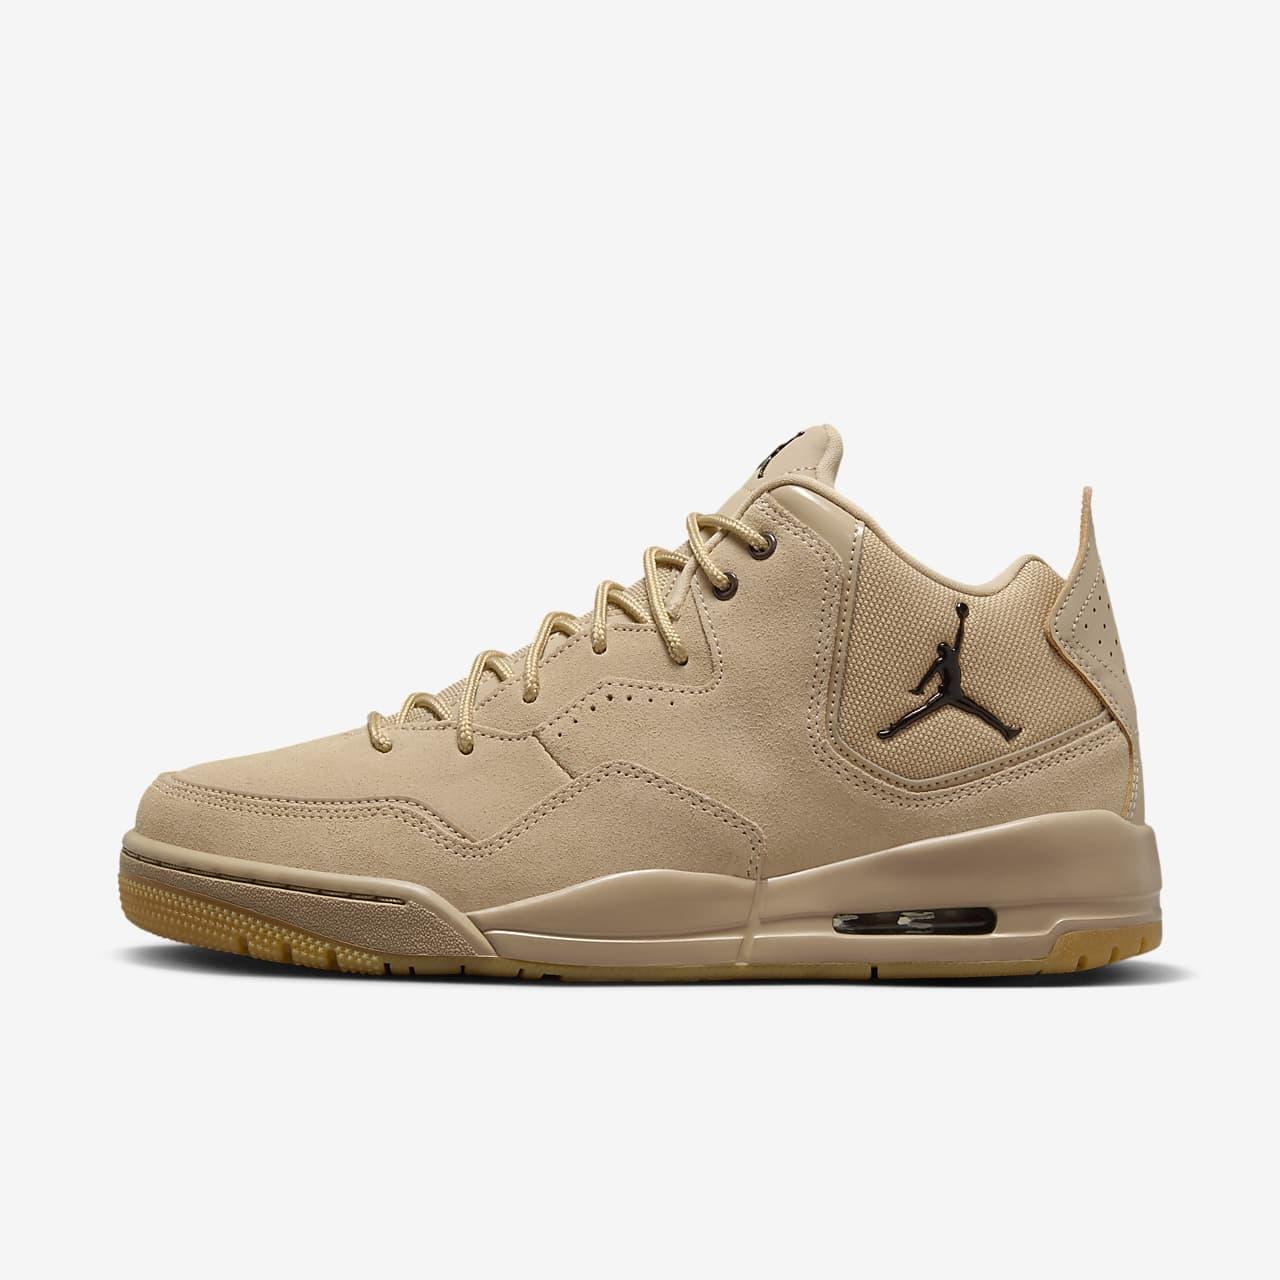 23 Homme We Chaussure Ma Courtside Pour Jordan Ewqa70v